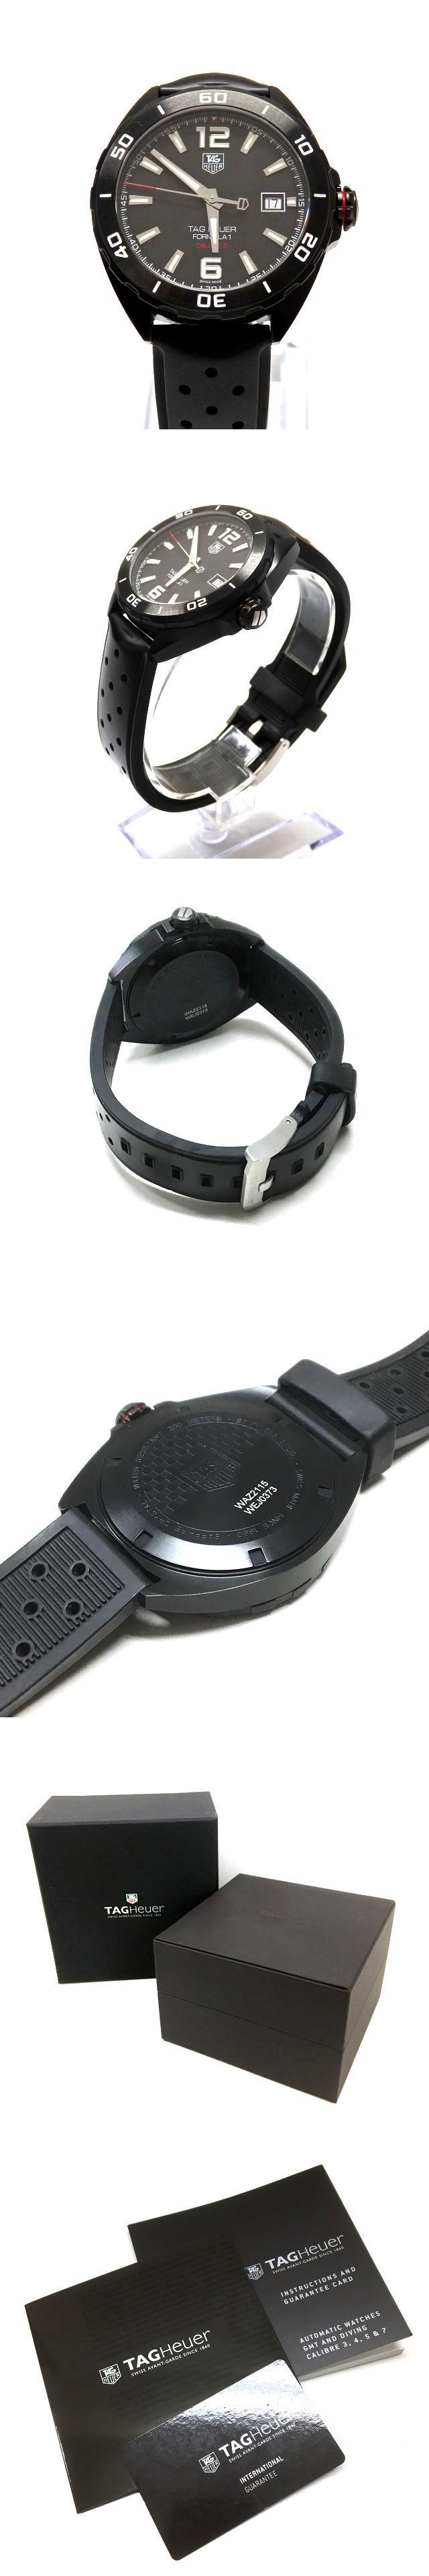 Formula 1 フォーミュラ1 キャリバー5 自動巻 腕時計 スポーツウォッチ WAZ2115.FT8023 ブラック 黒 SSAW